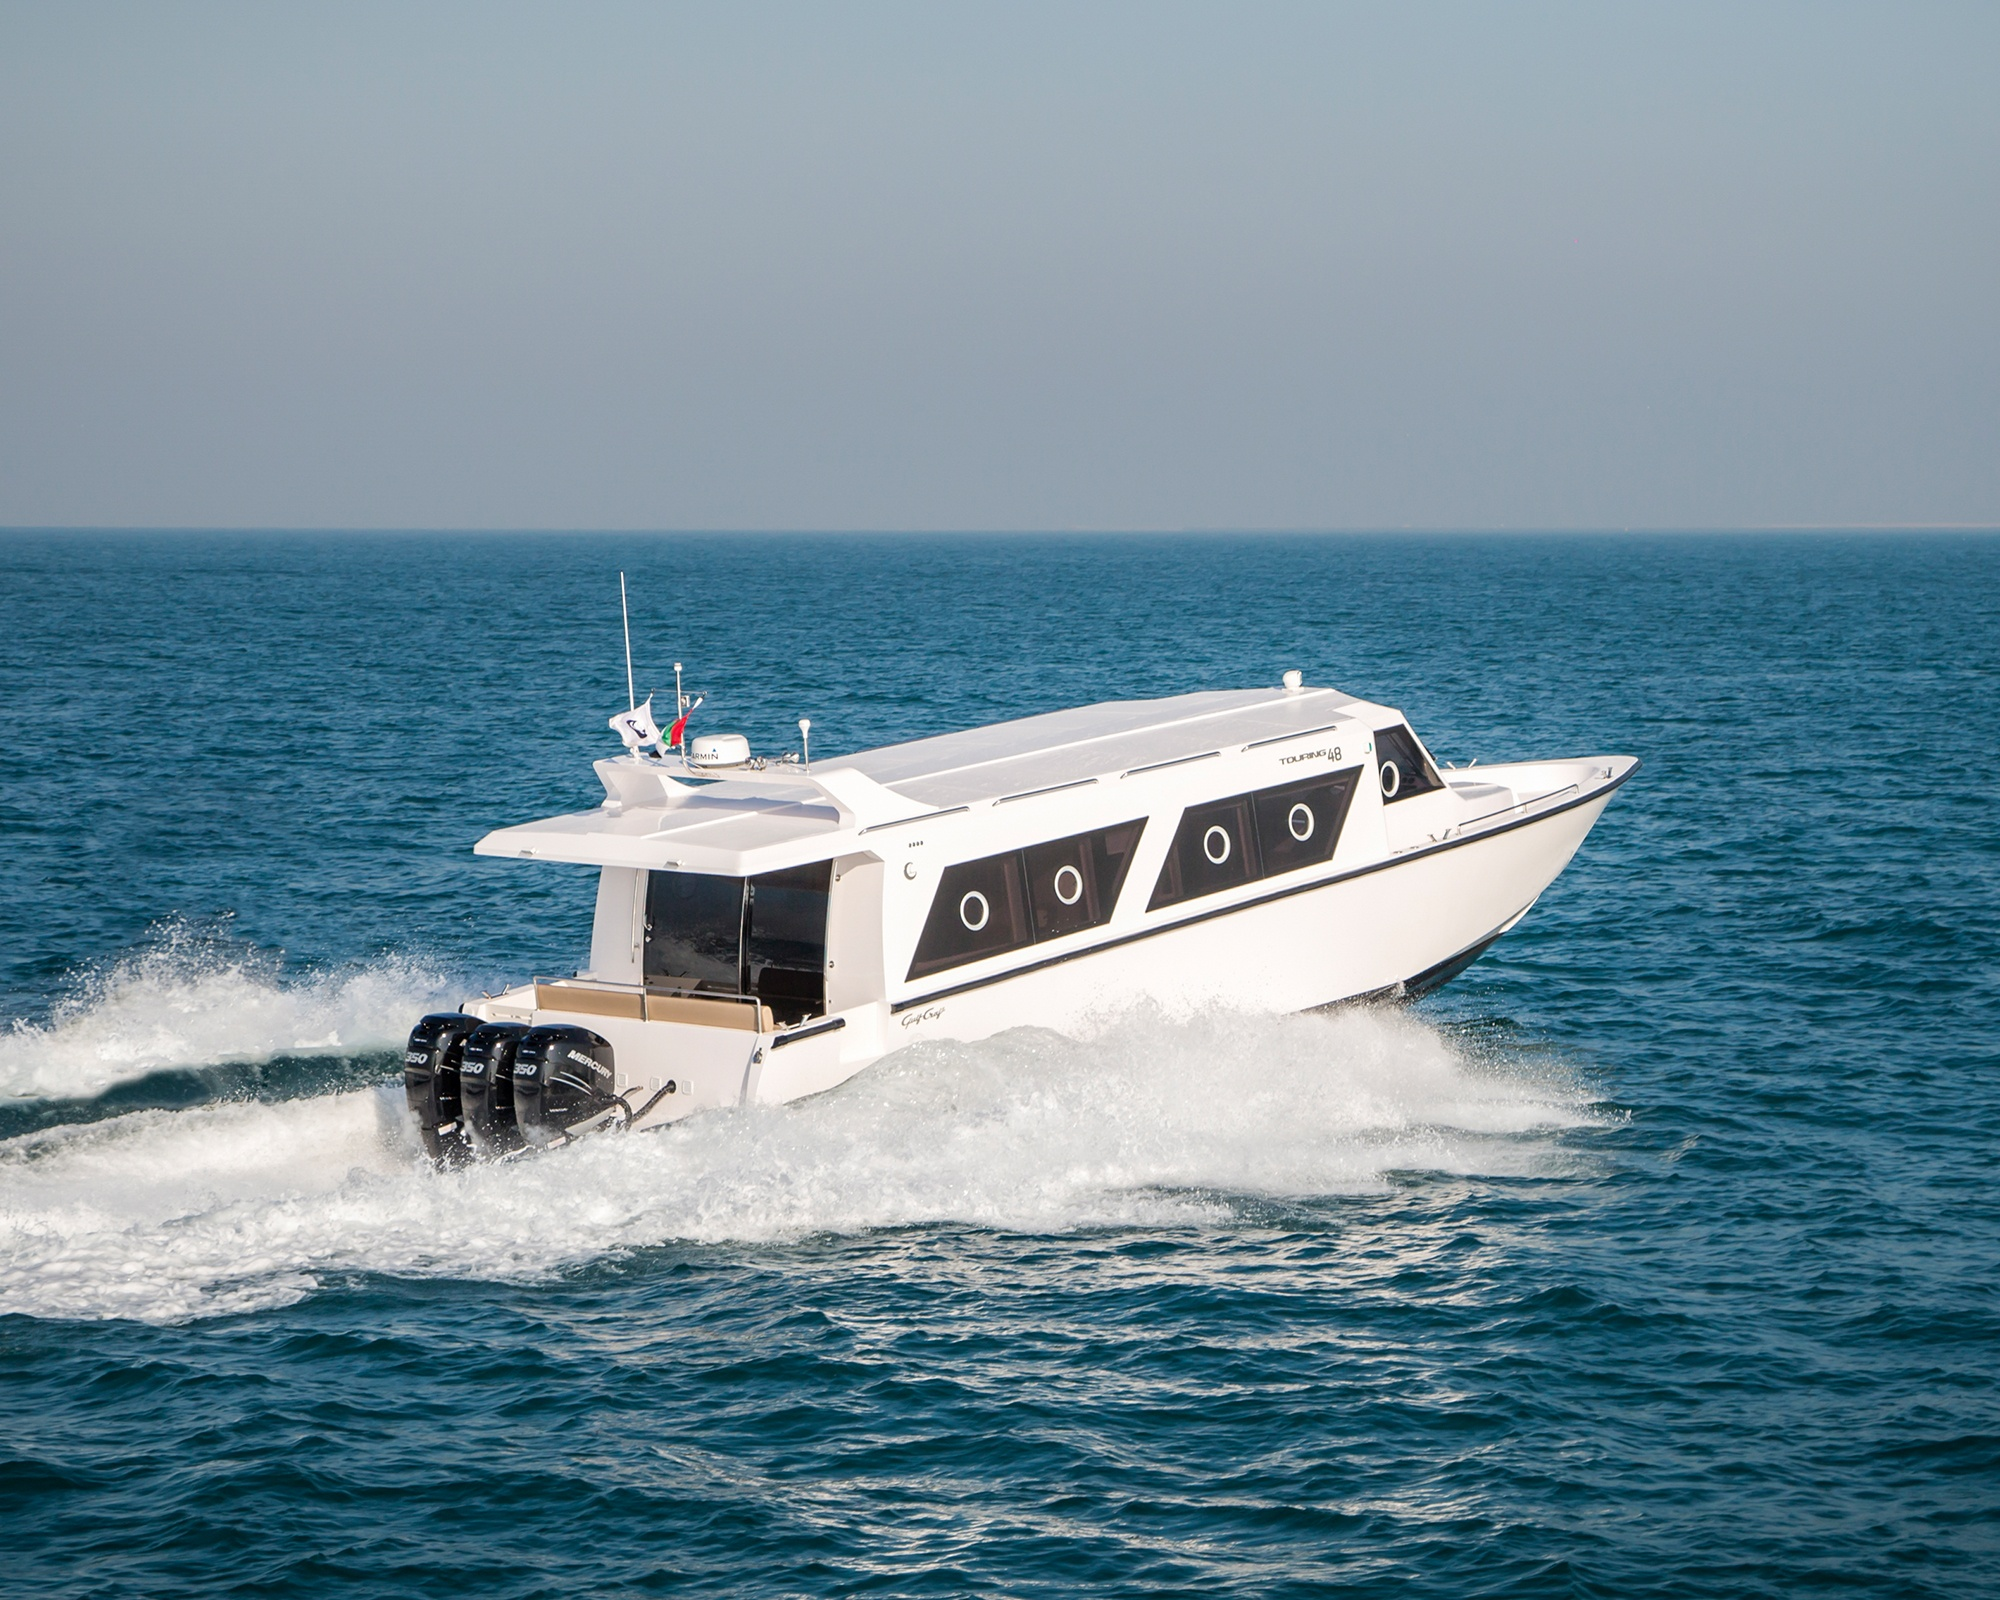 Touring 48 VIP passenger boat